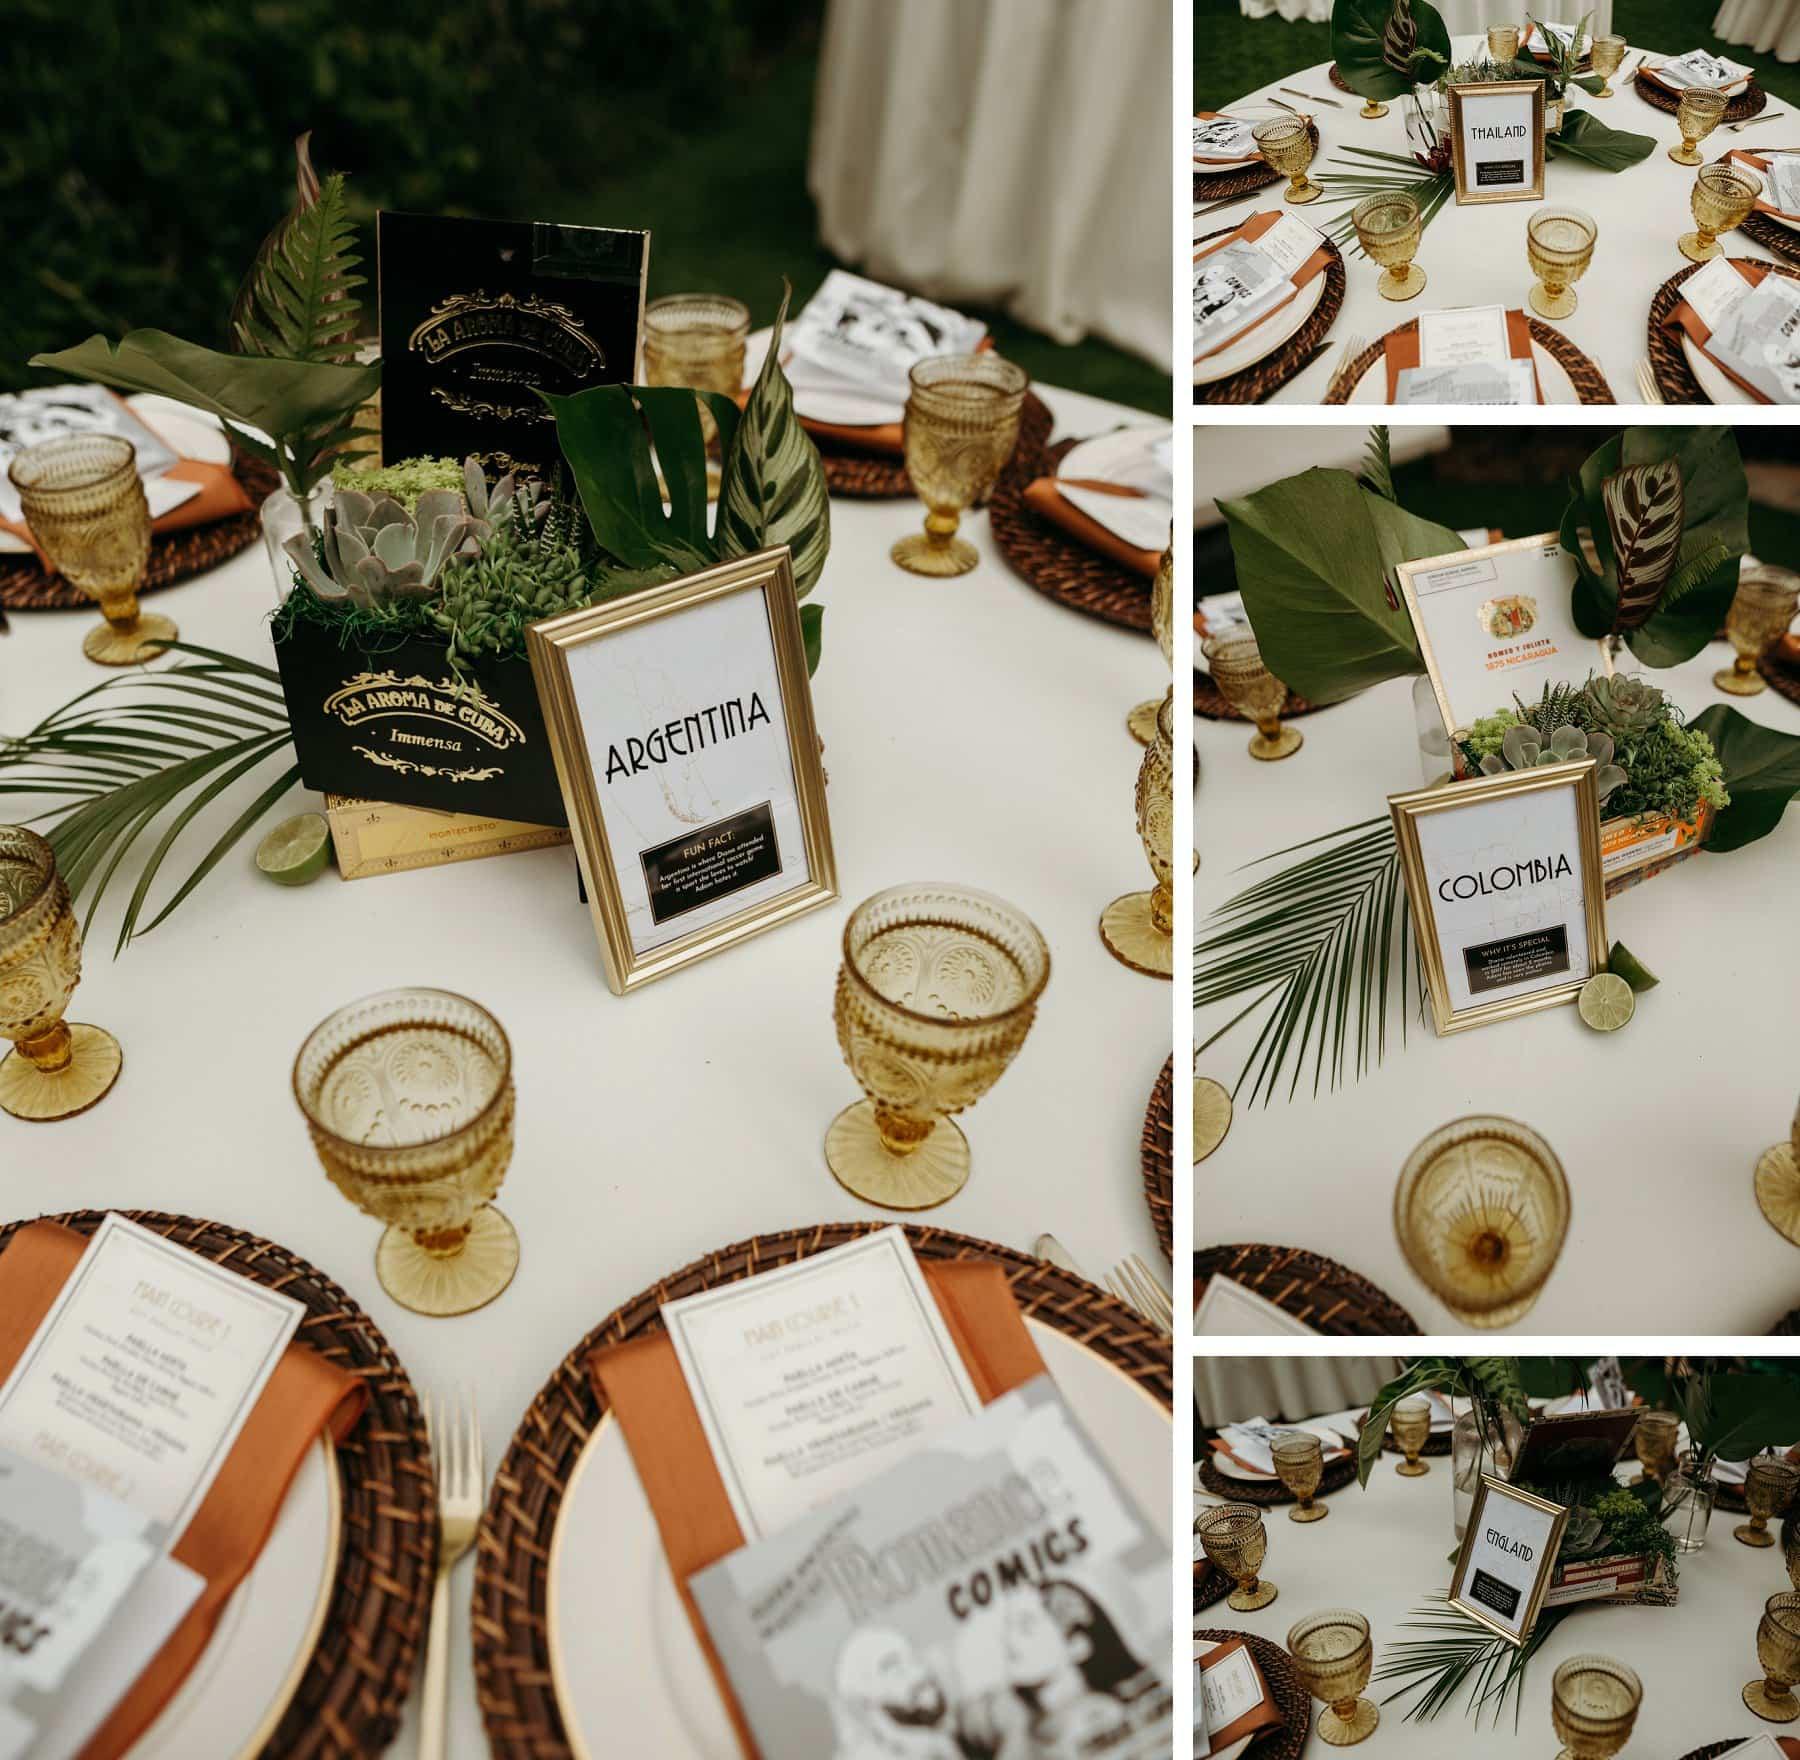 cuban inspired tabletop settings